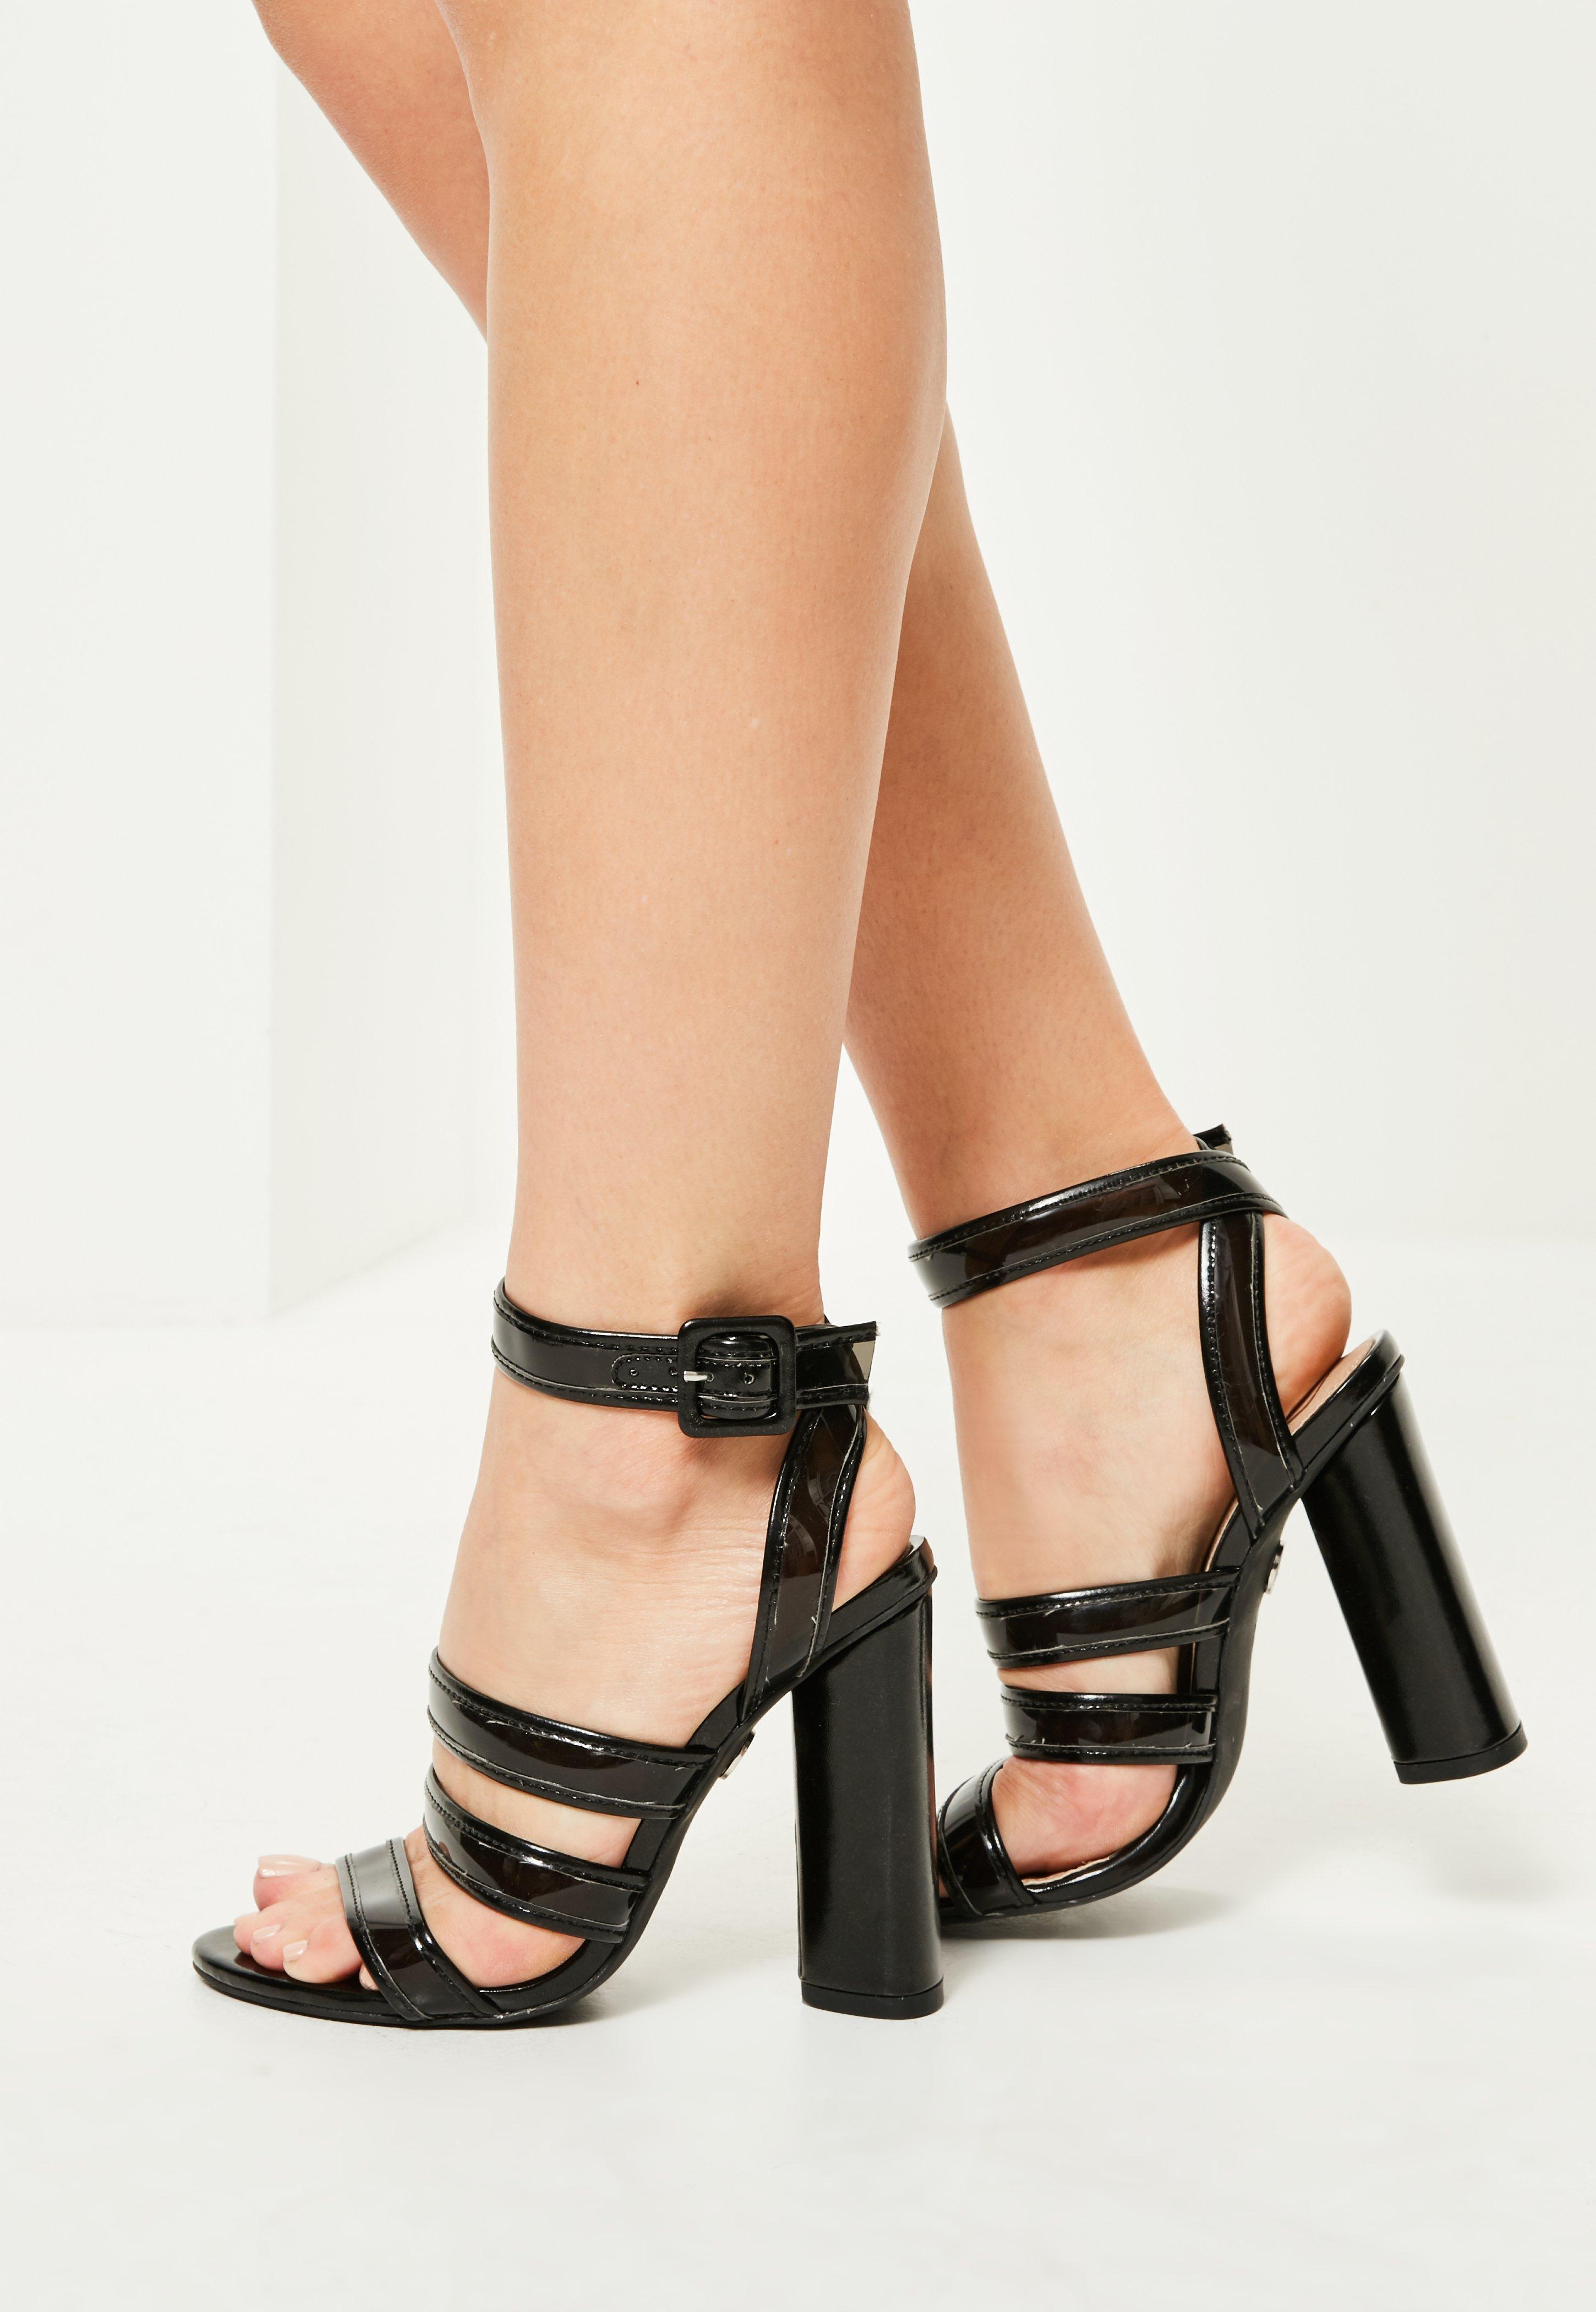 b0590c3a124 Missguided Black Multi Strap Block Heeled Sandals in Black - Lyst